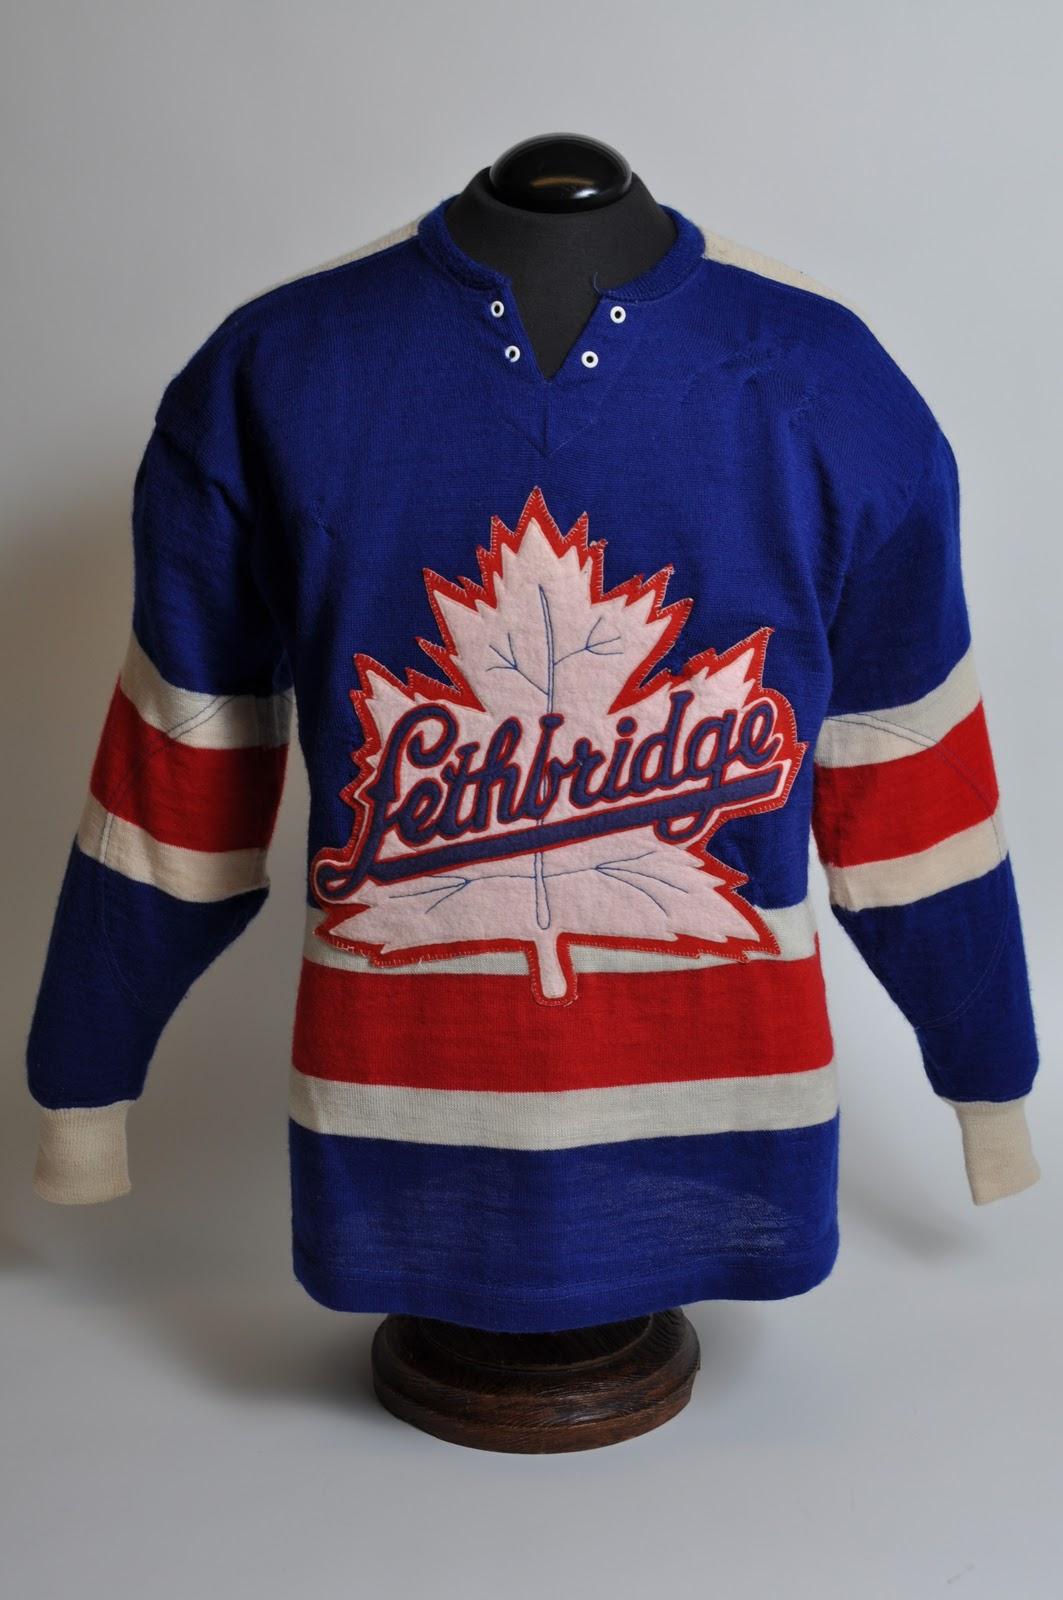 Lethbridge Maple Leafs